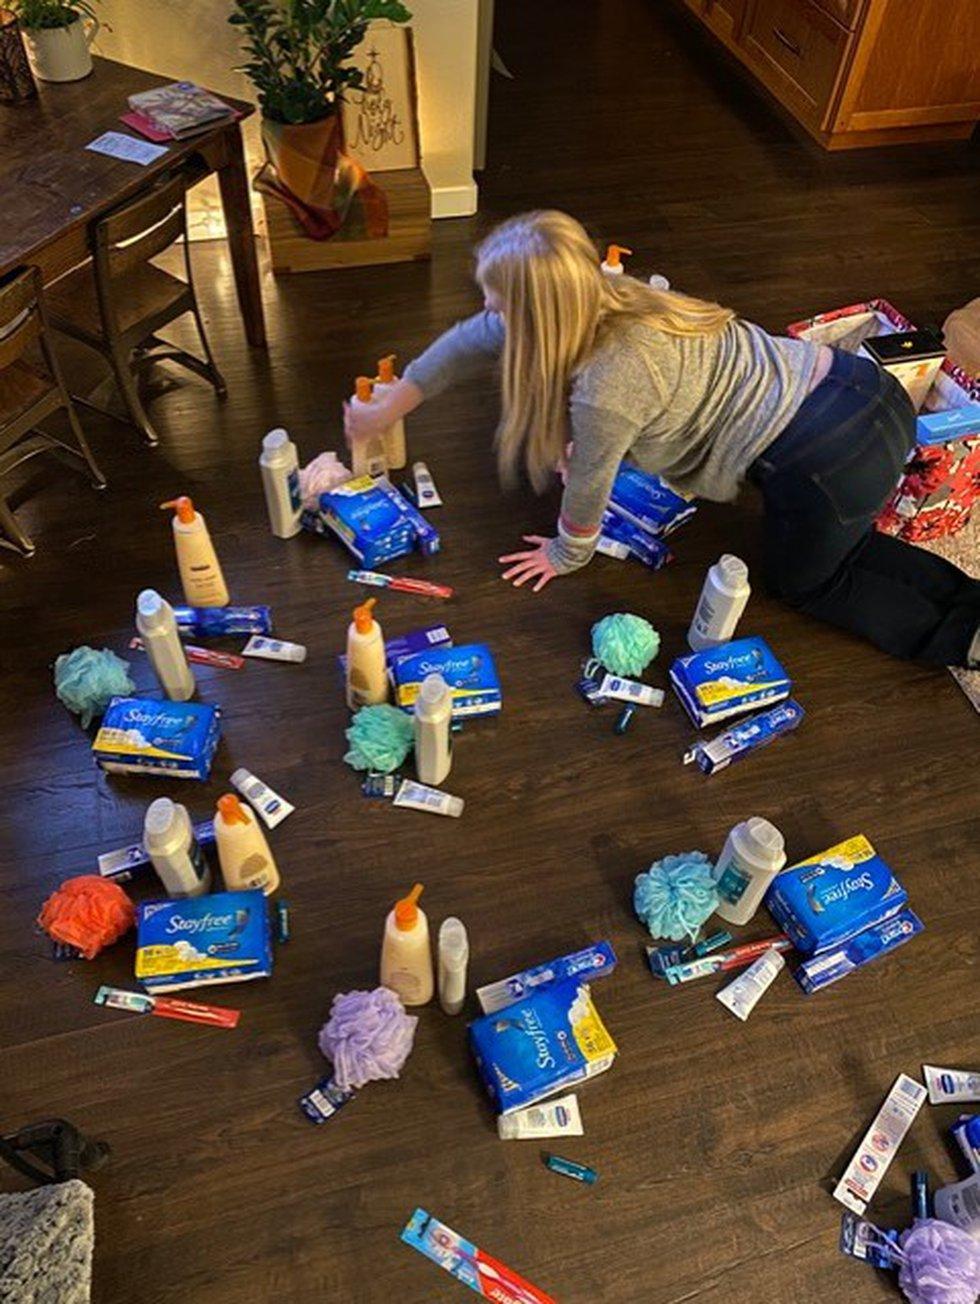 Assembling GracePacks to donate to women in need.